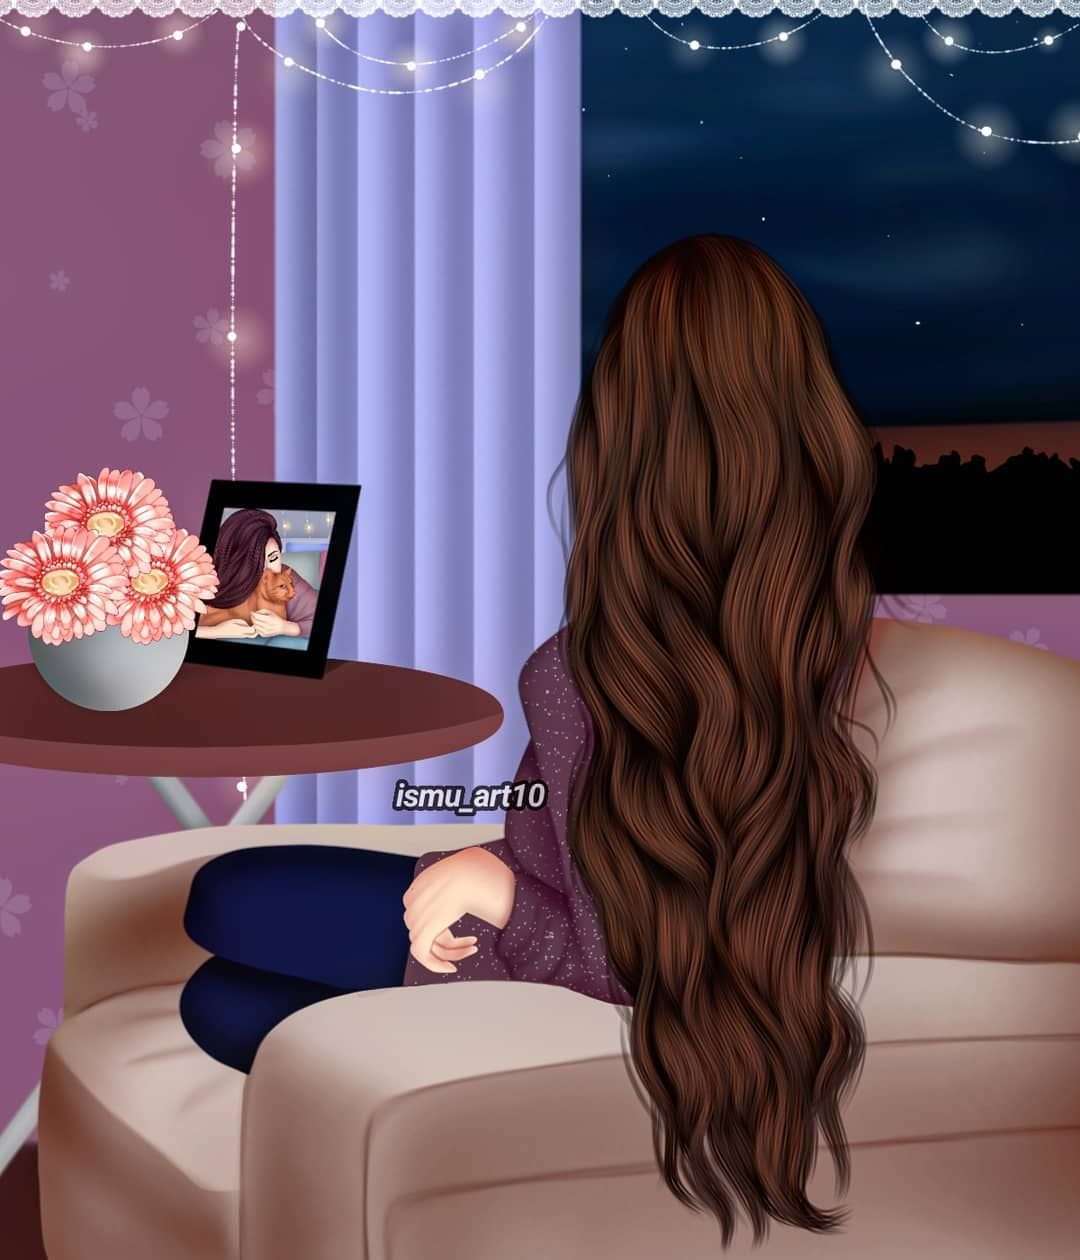 Long Hair Brown Color Beautiful Hot Cute Girl Wallpaper Lovely Girl Image Beautiful Girl Drawing